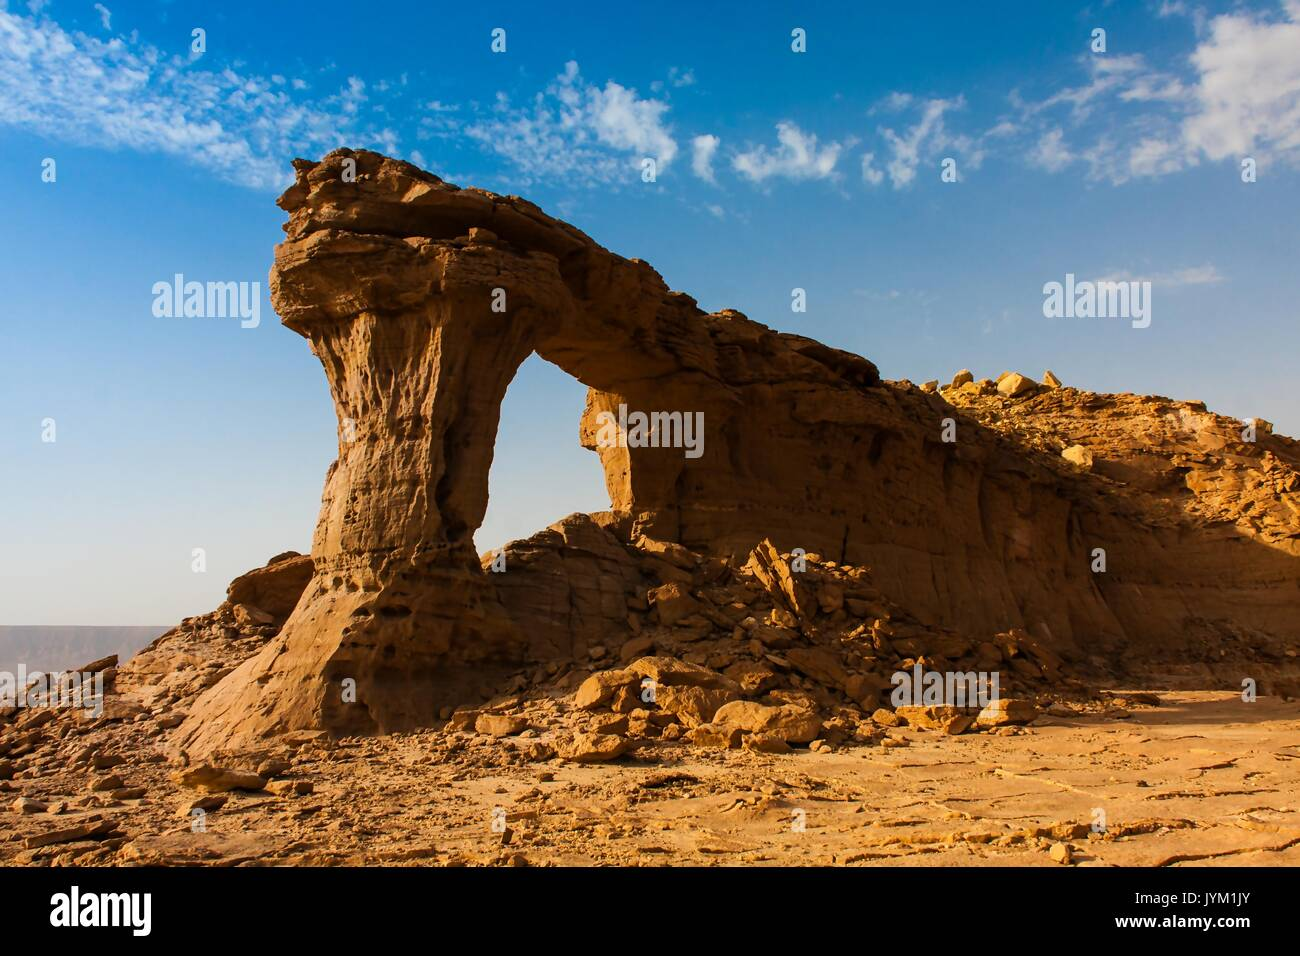 L'Arco Naturale di Riyadh, Arabia Saudita Immagini Stock